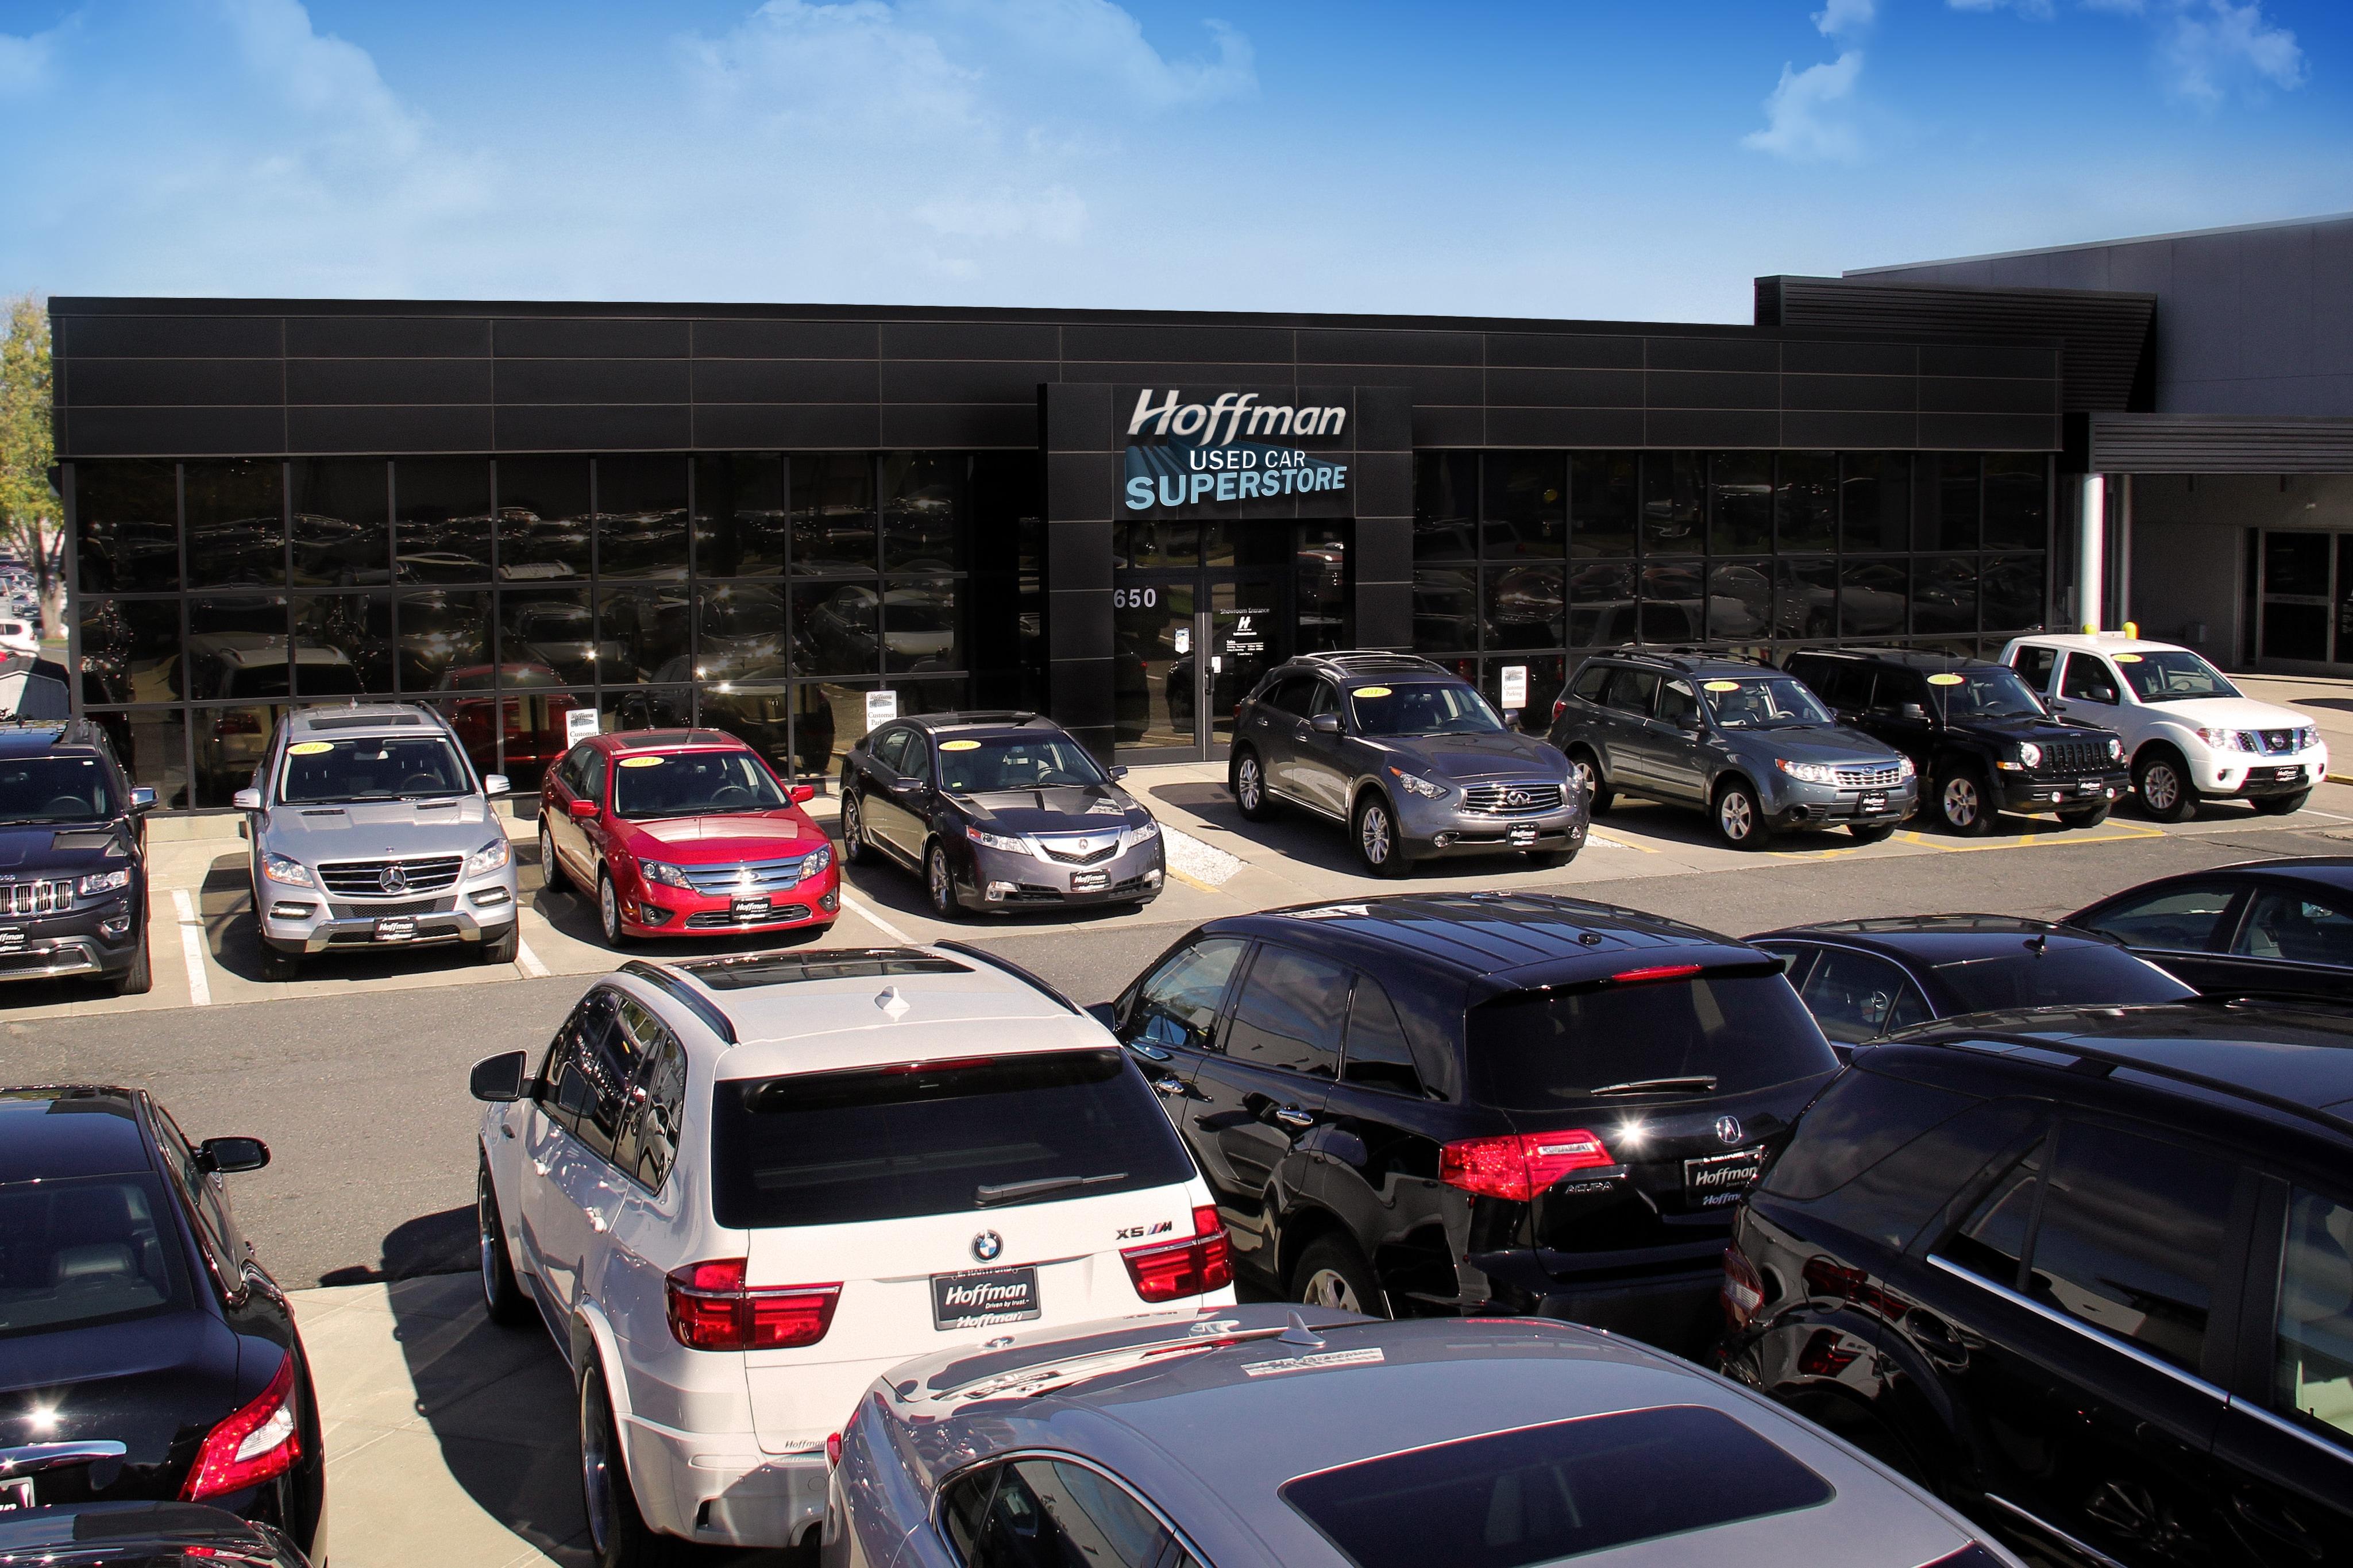 Hoffman Used Car Superstore